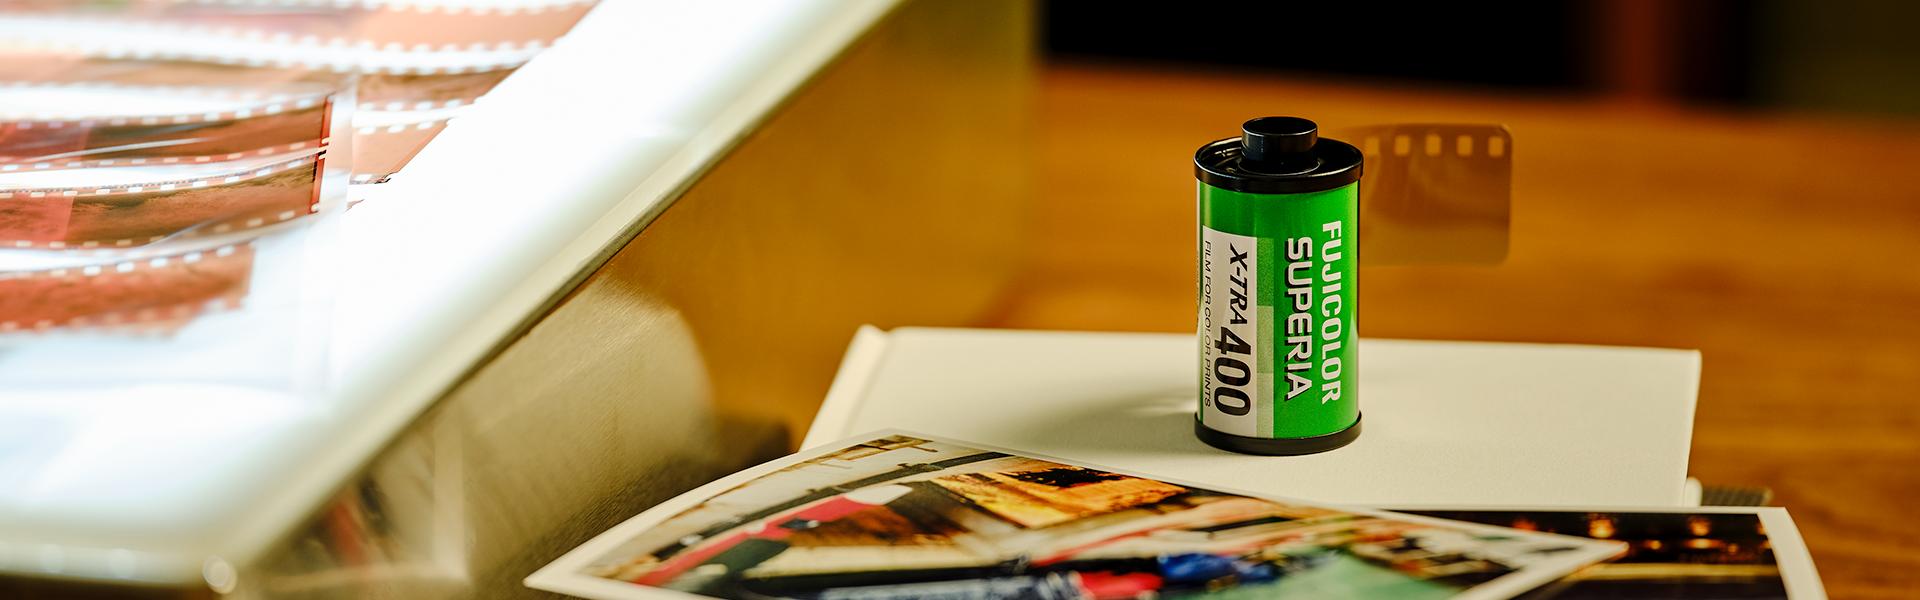 [photo] 흰색 책 위에 놓인 Fujicolor Superia X-Tra 400 필름과 옆에 놓인 인화 샘플과 네거티브 필름